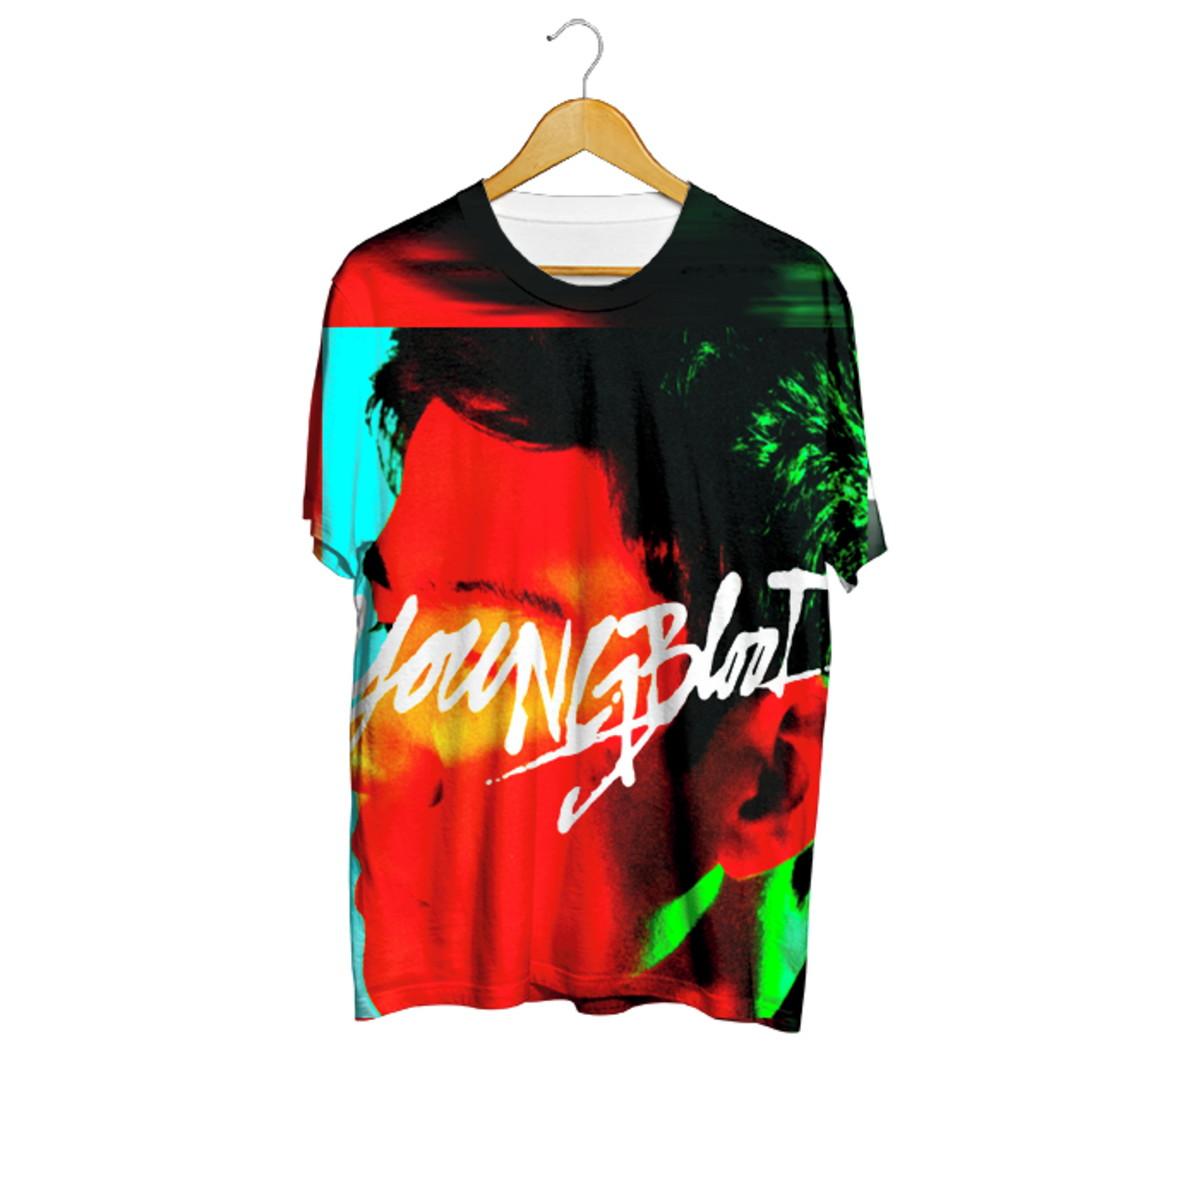 78d9e11626a Camiseta Calum Youngblood - 5 Seconds Of Summer no Elo7